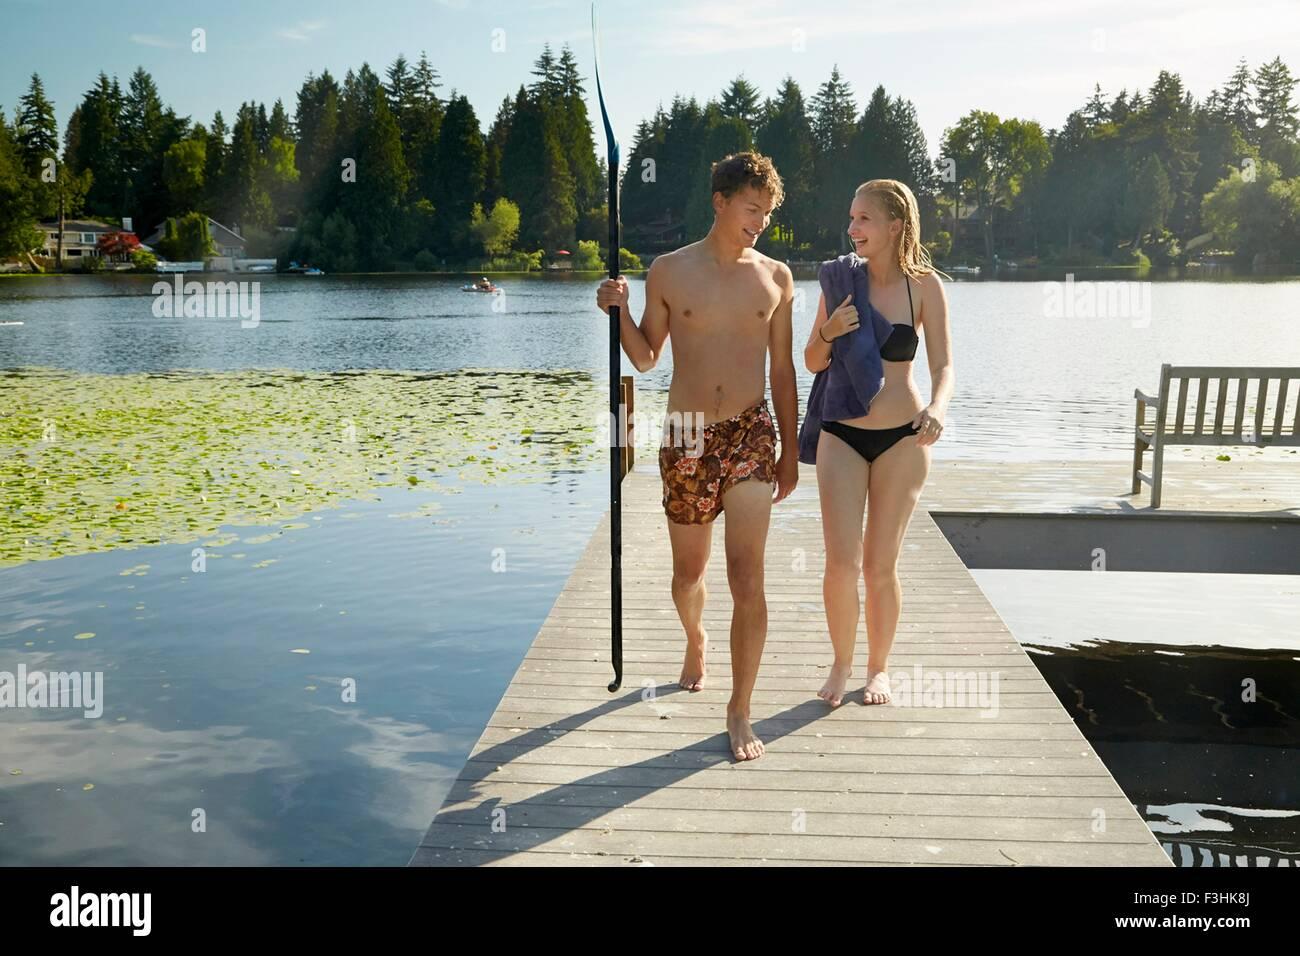 Couple leaving lake after swim, Seattle, Washington, USA - Stock Image